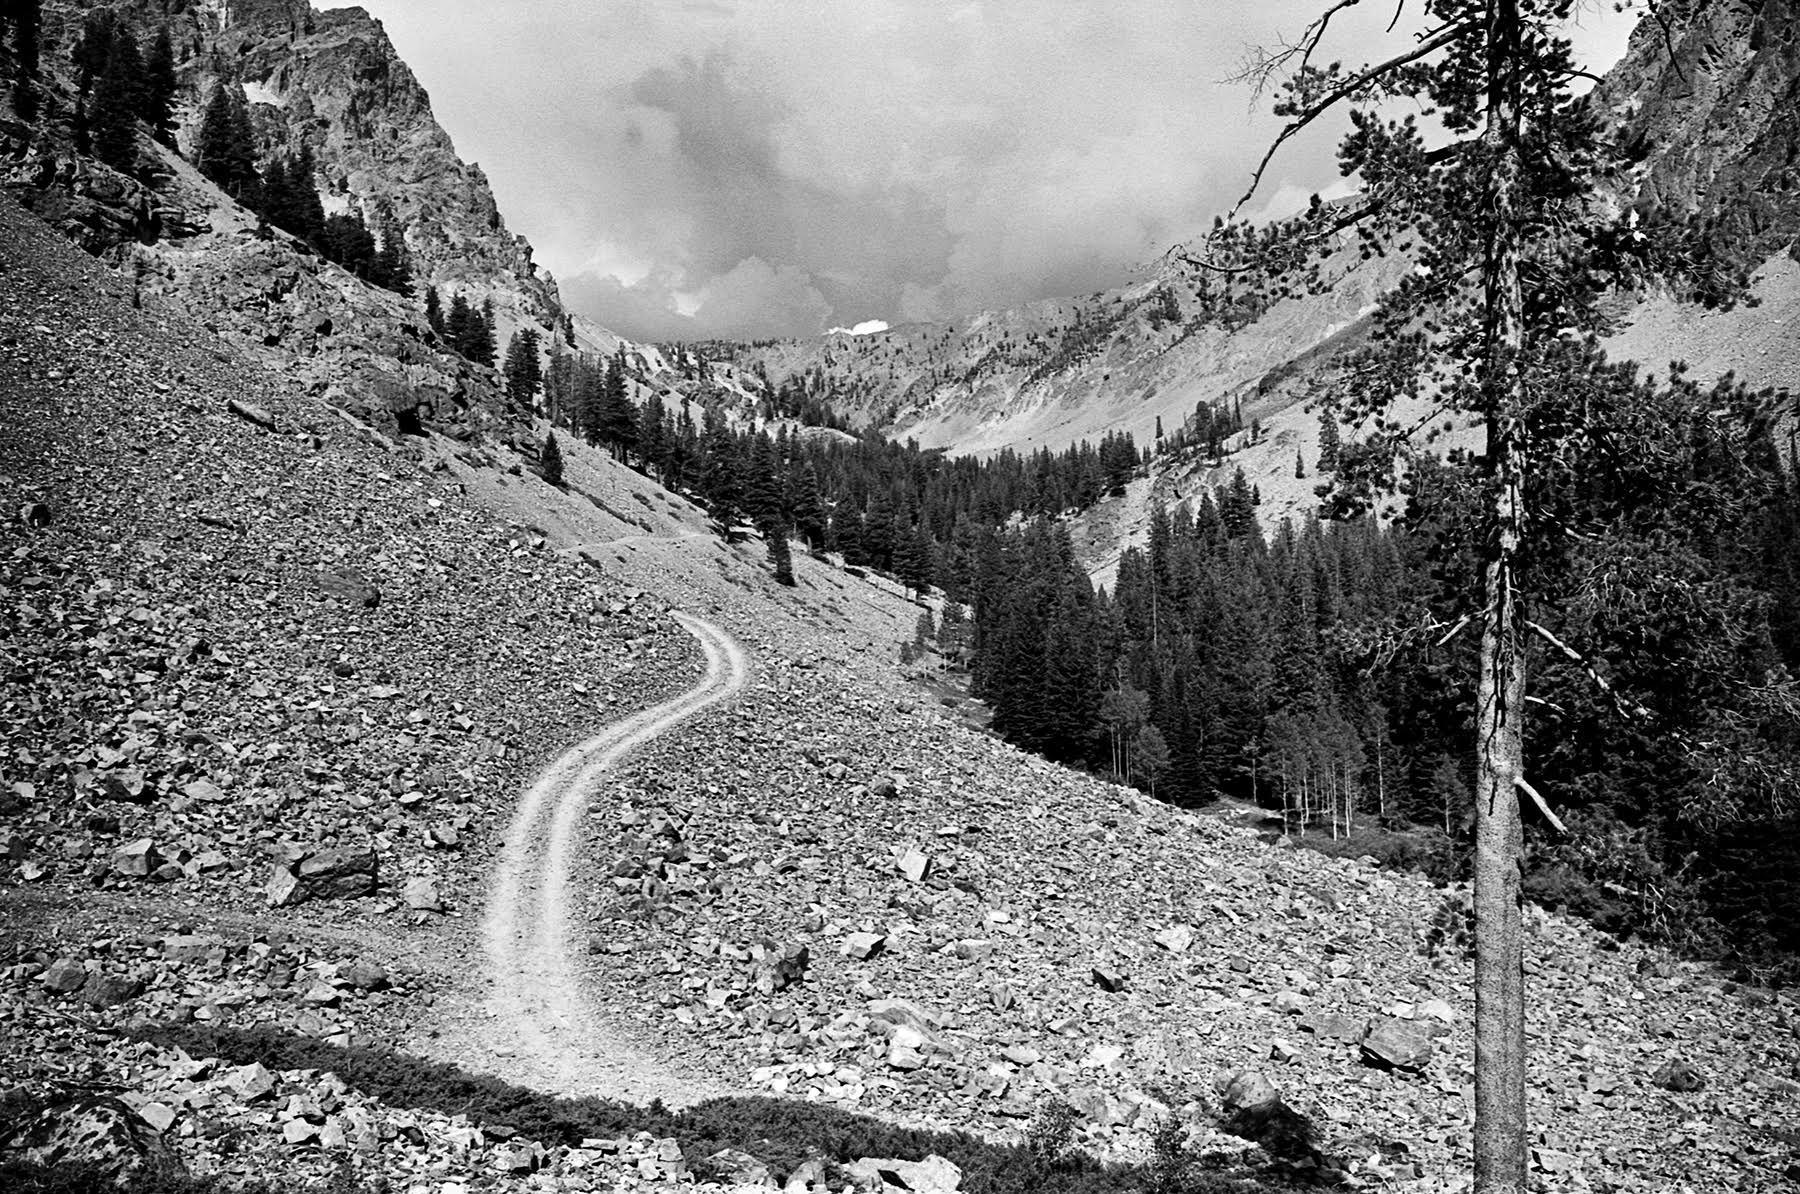 Boulder basin 1975…Aug. 1975 Leica M5, 35mm Summicron, Ilford Pan F